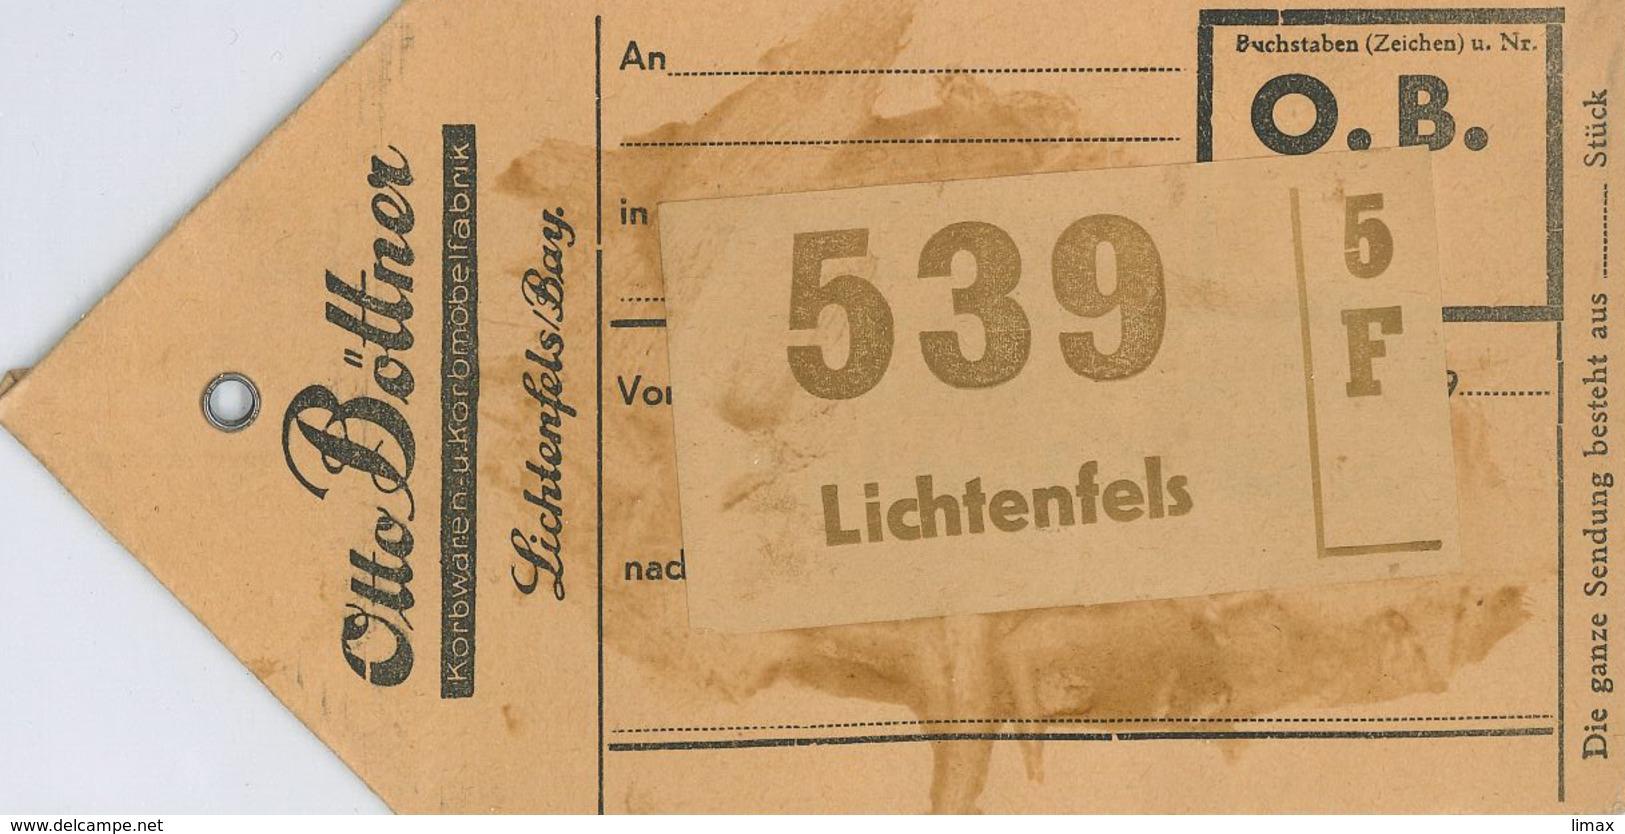 Otto Böttner Lichtenfels Korbwaren Rattan Korbmöbelfabrik Paketanhänger Kofferanhänger O.b. - Briefe U. Dokumente